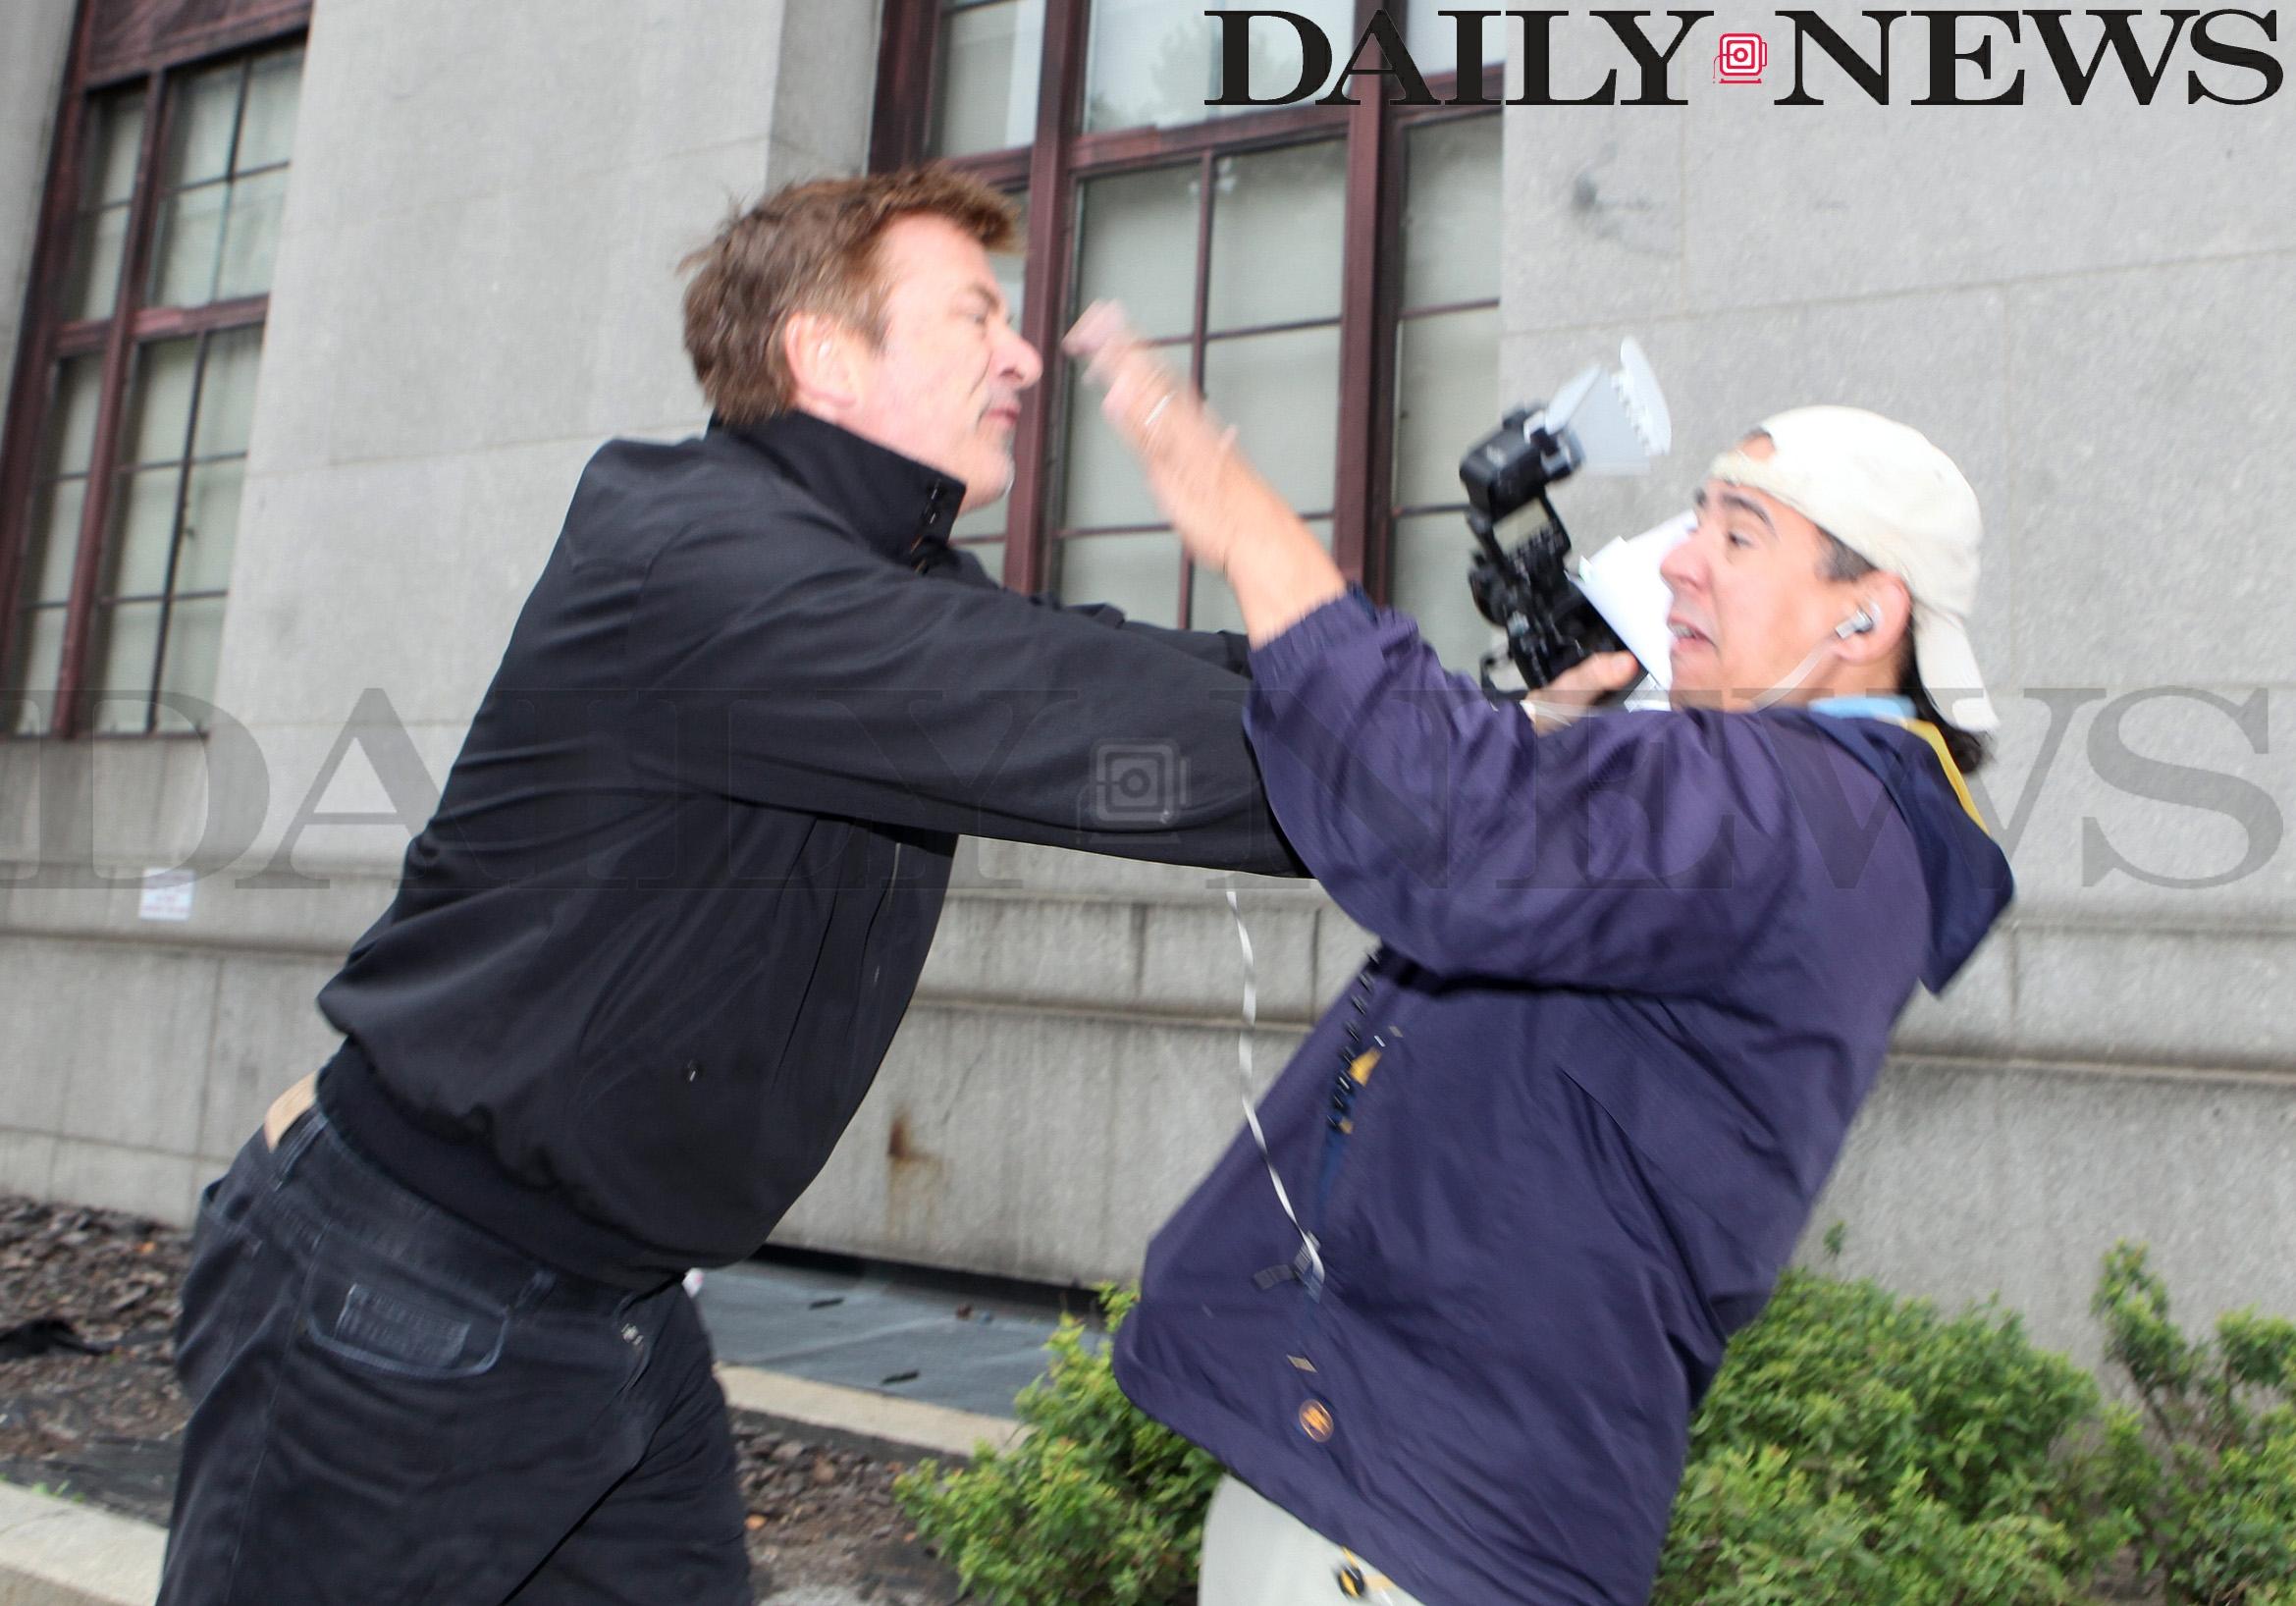 Alec Baldwin photographed punching photographer.